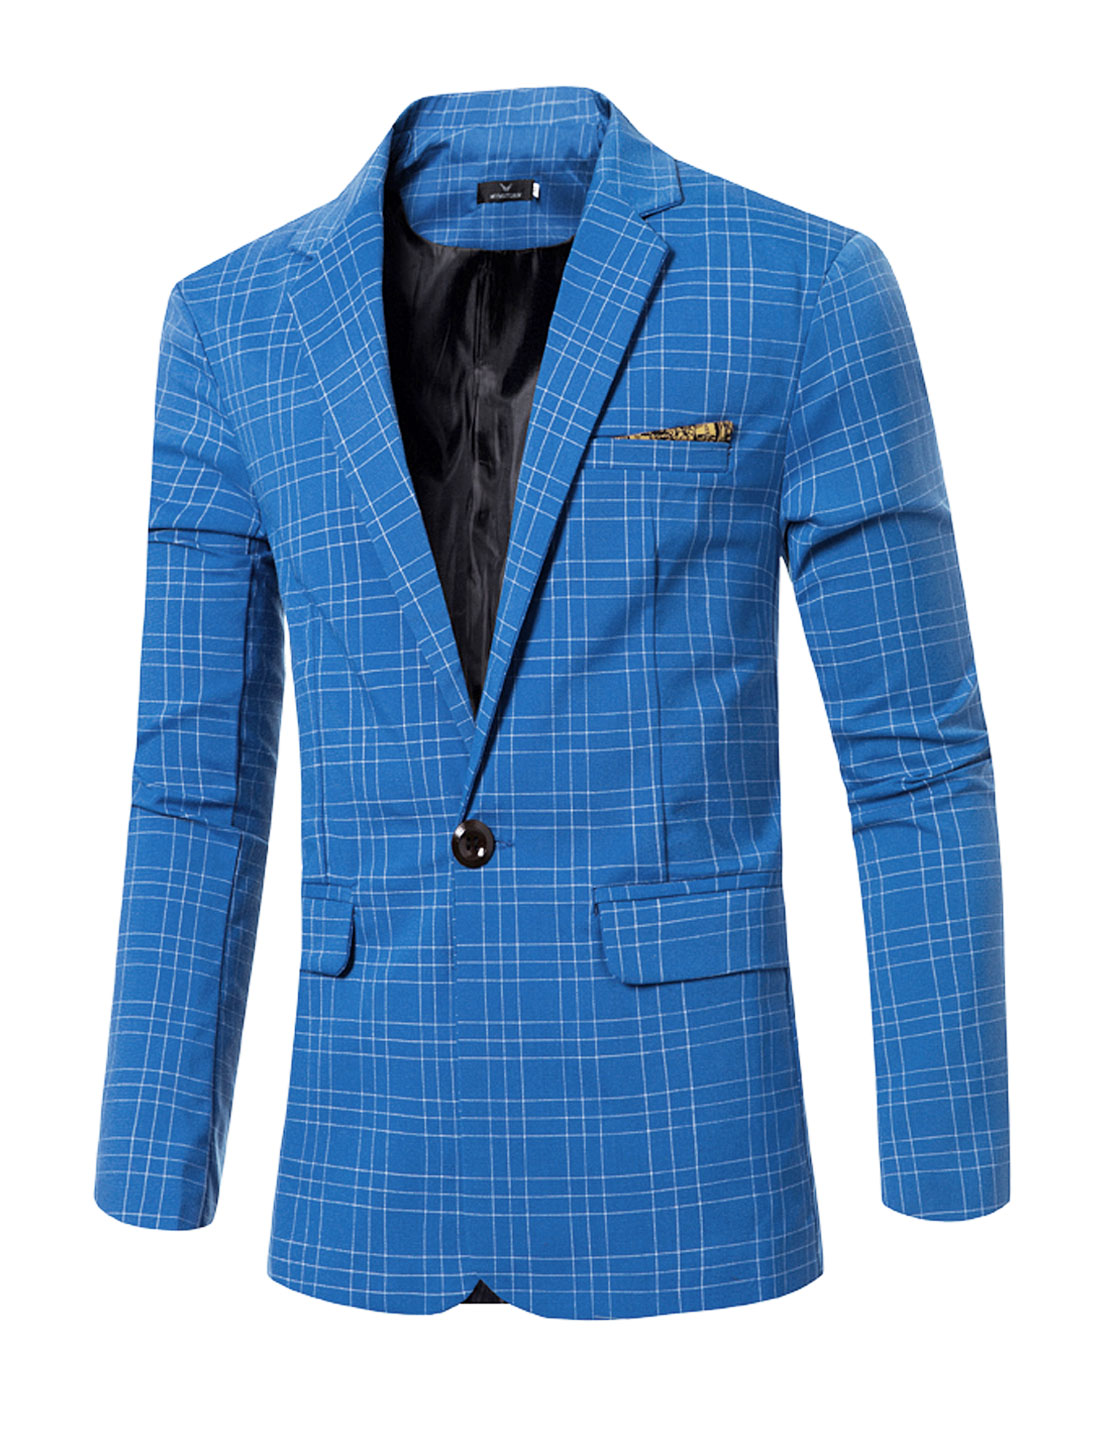 Men Notched Lapel Flap Pockets Checks One-Button Blazer Blue S